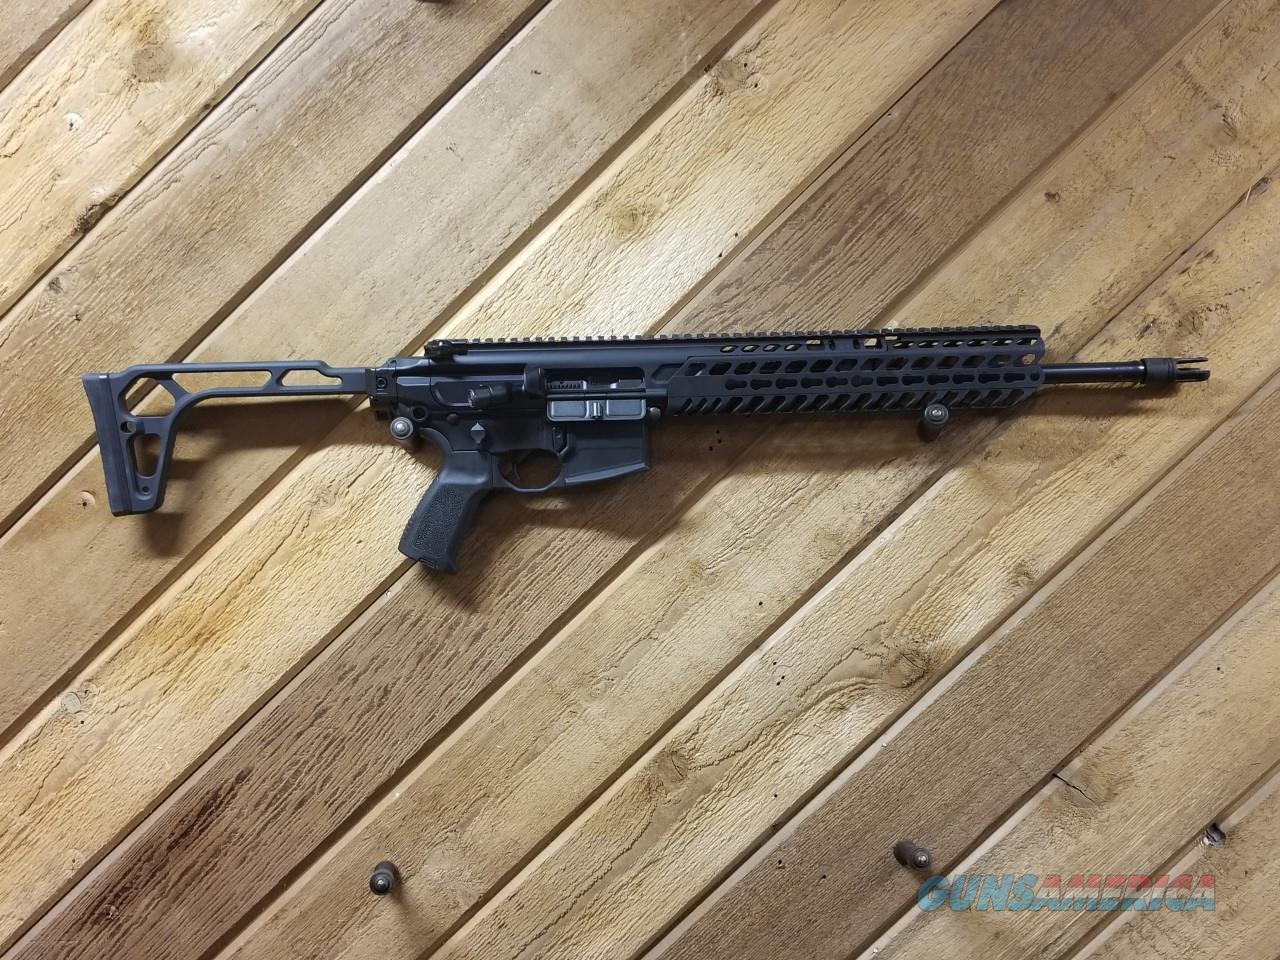 SIG SAUER MCX 300BLK USED SHIPS FREE NO CC FEE  Guns > Rifles > Sig - Sauer/Sigarms Rifles